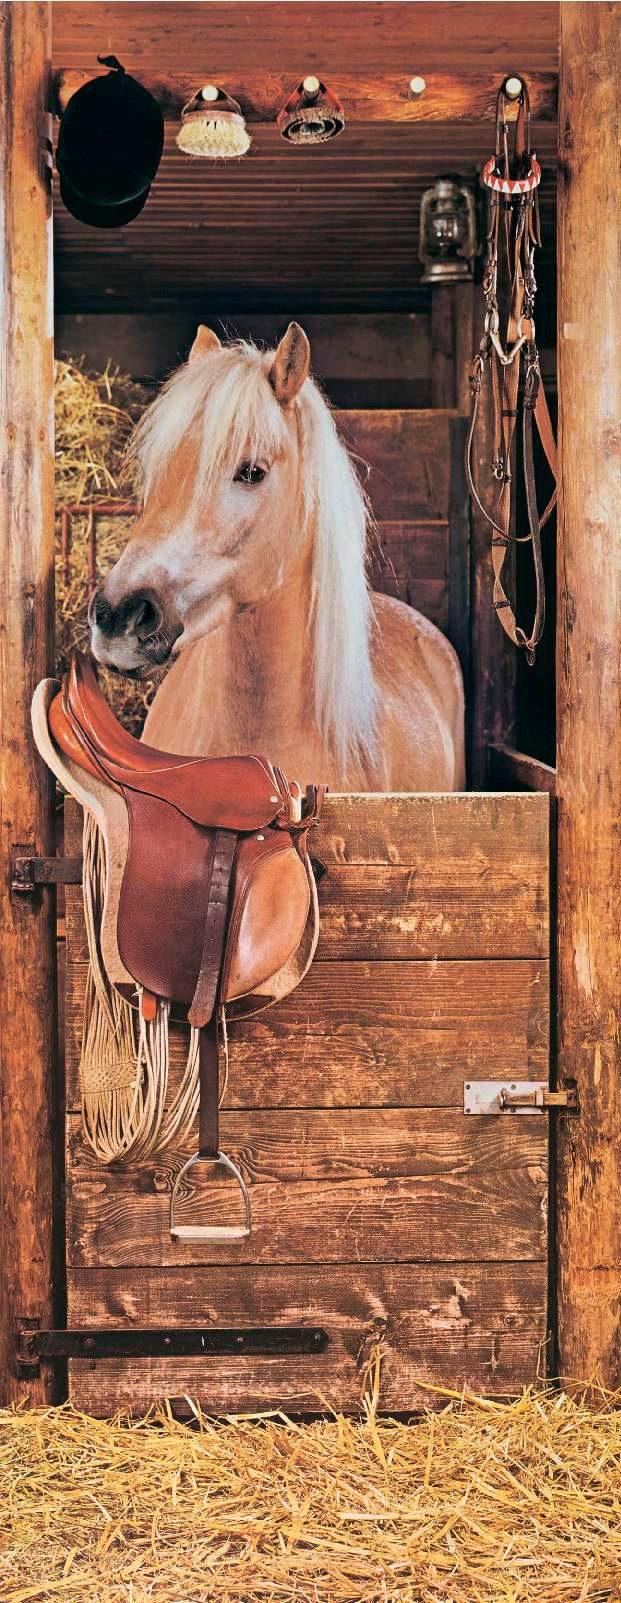 PAPERMOON Fototapete »Horse in Stable - Türtapete«, Vlies, 2 Bahnen, 90 x 200 cm